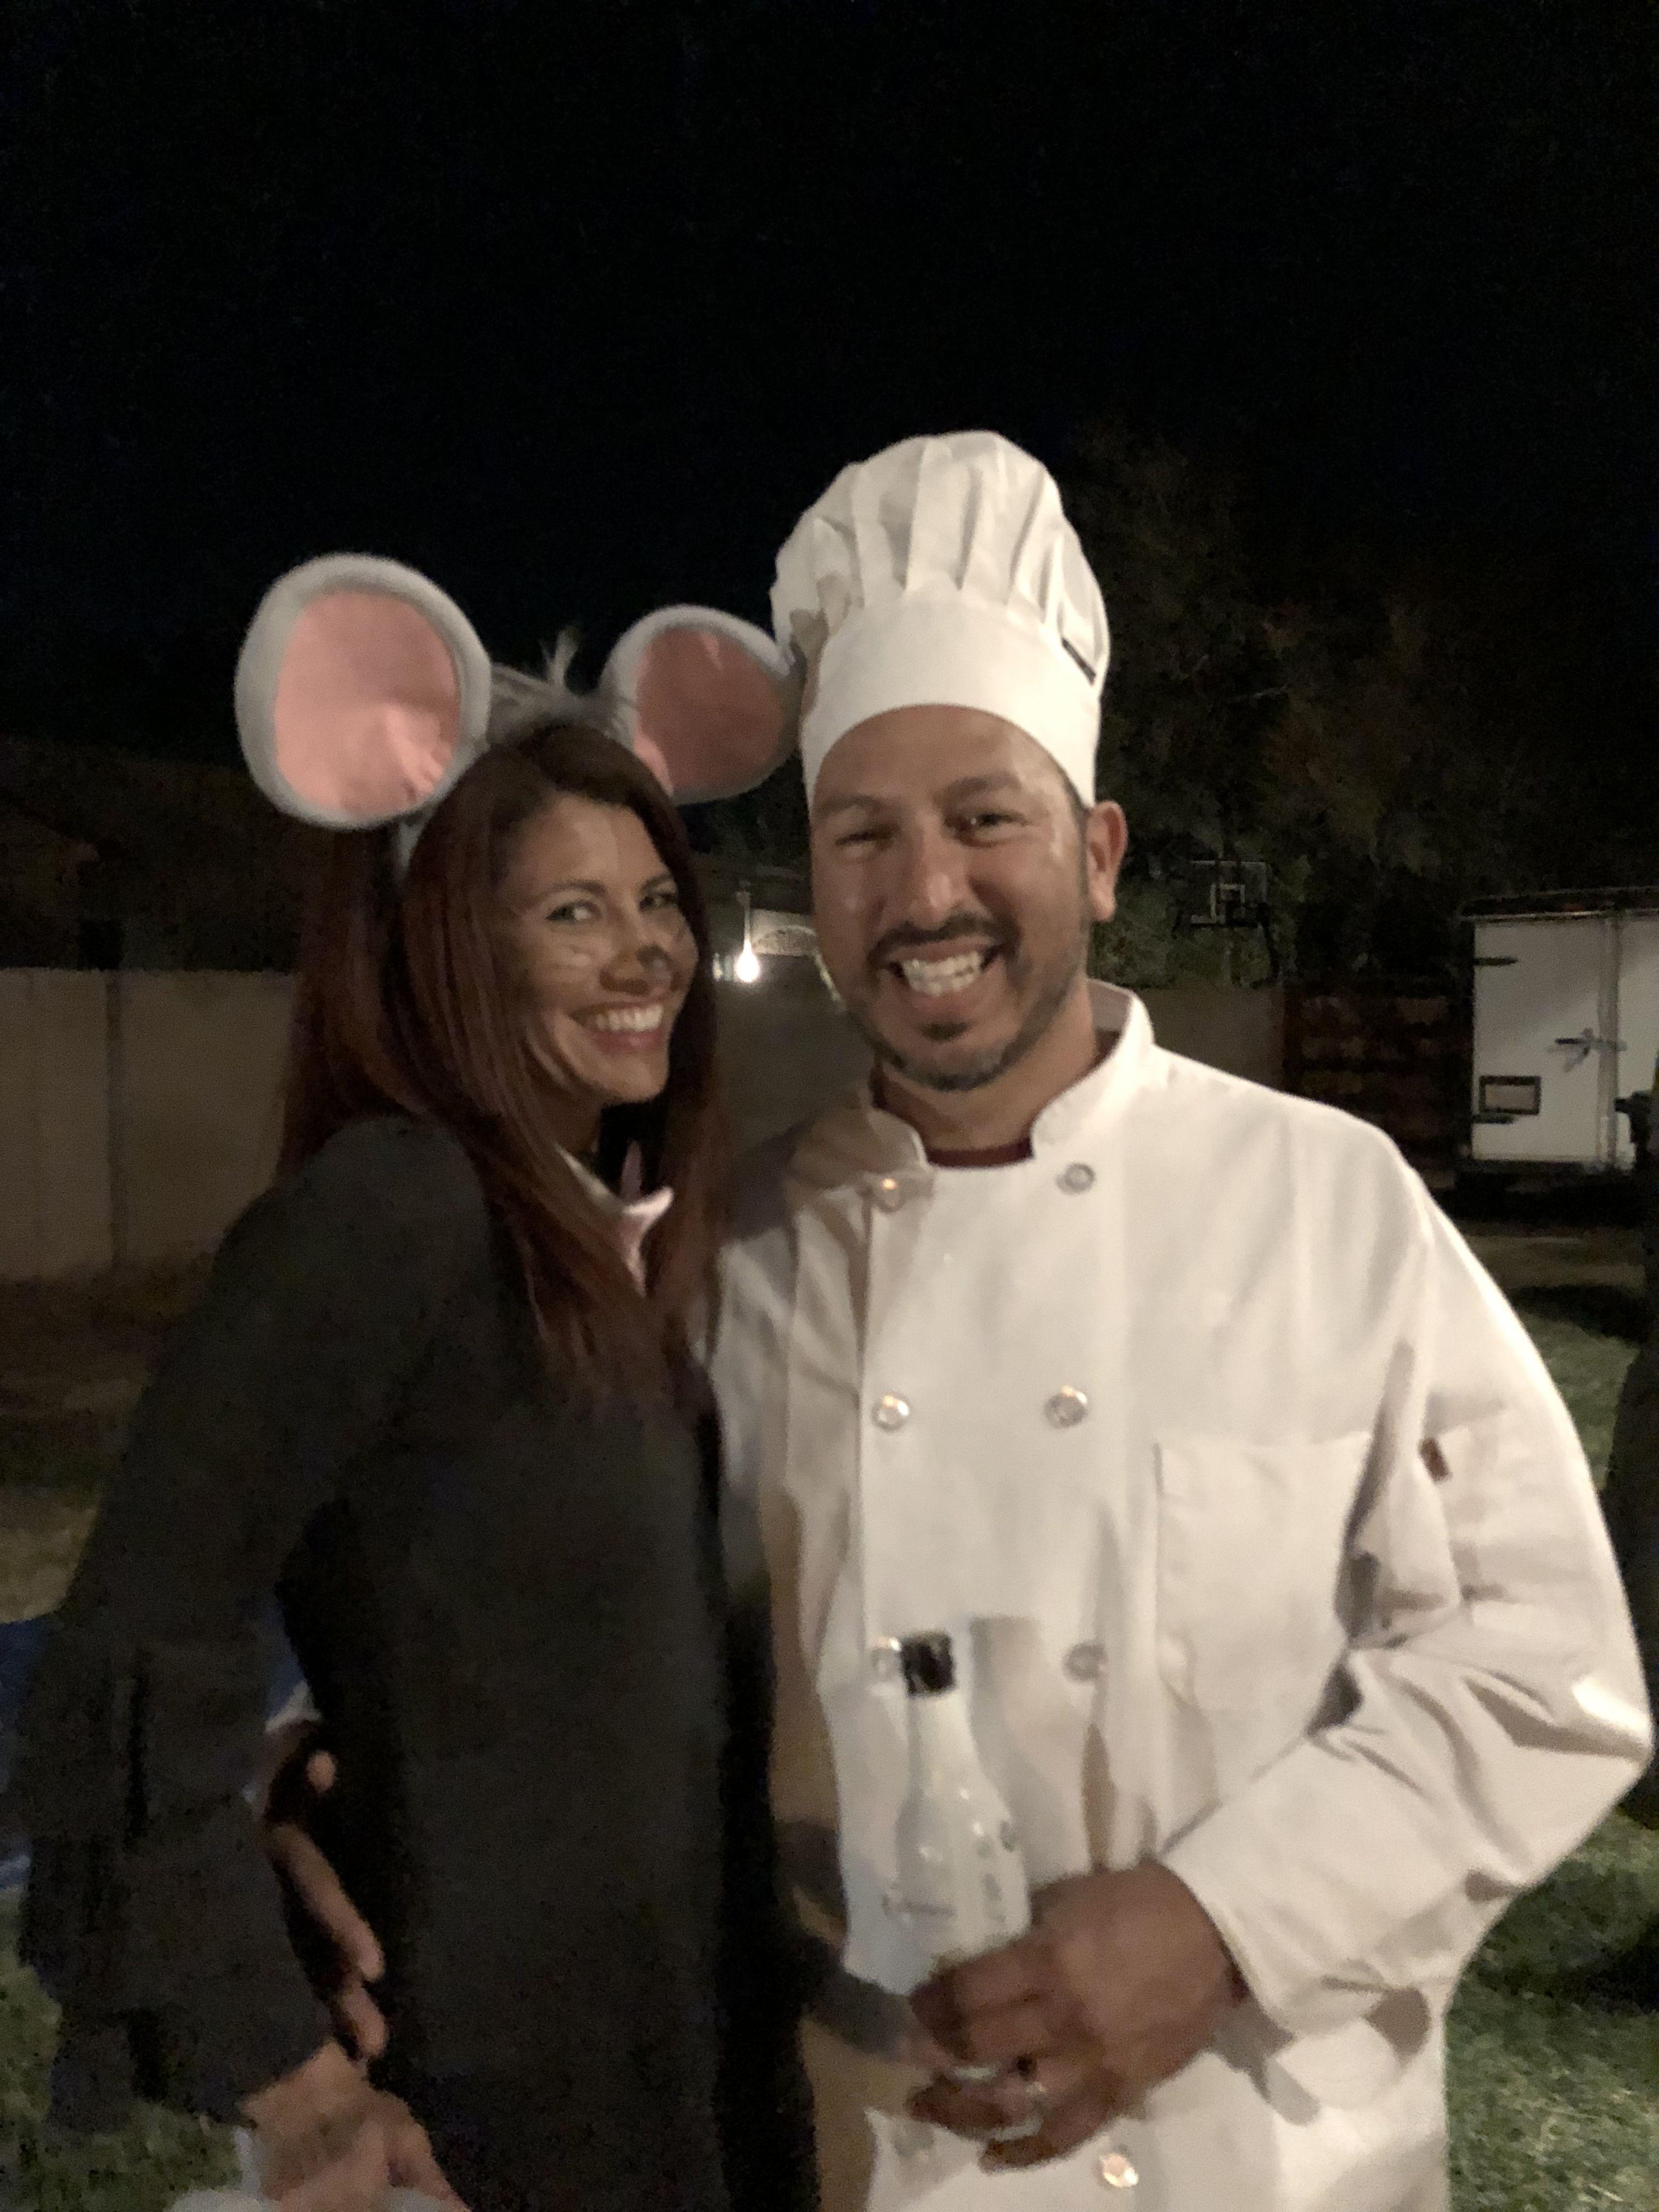 Remy And Chef Linguini From Ratatouille Linguini Ratatouille Beanie